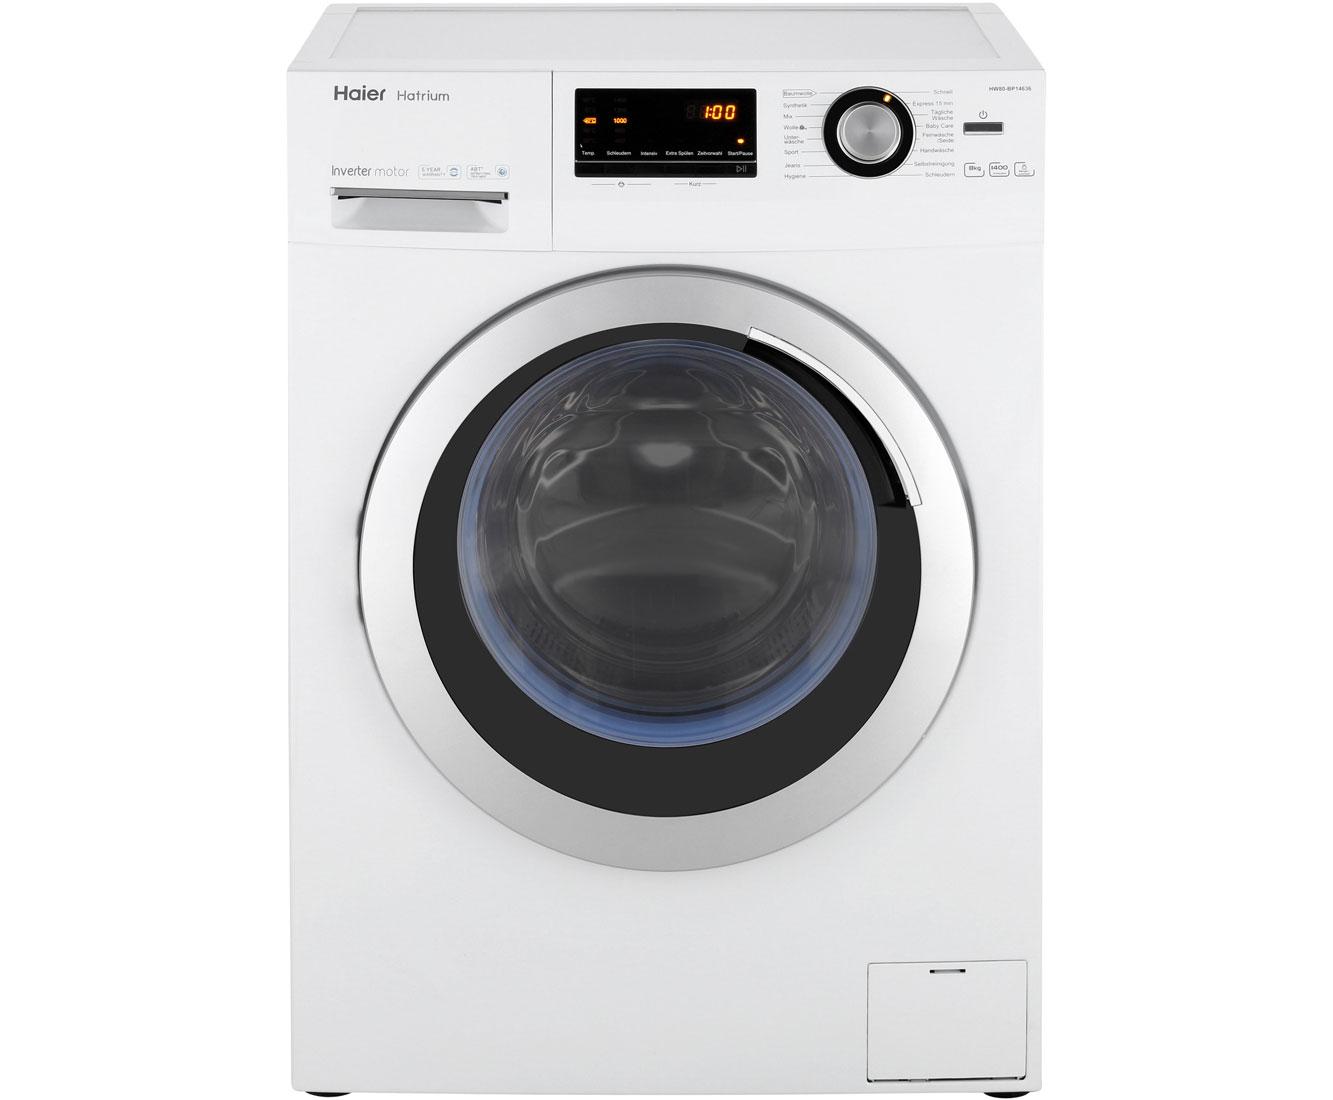 Haier HW80-BP14636 | Waschmaschine | Weiß, 8 kg, 1400 U/Min, A+++